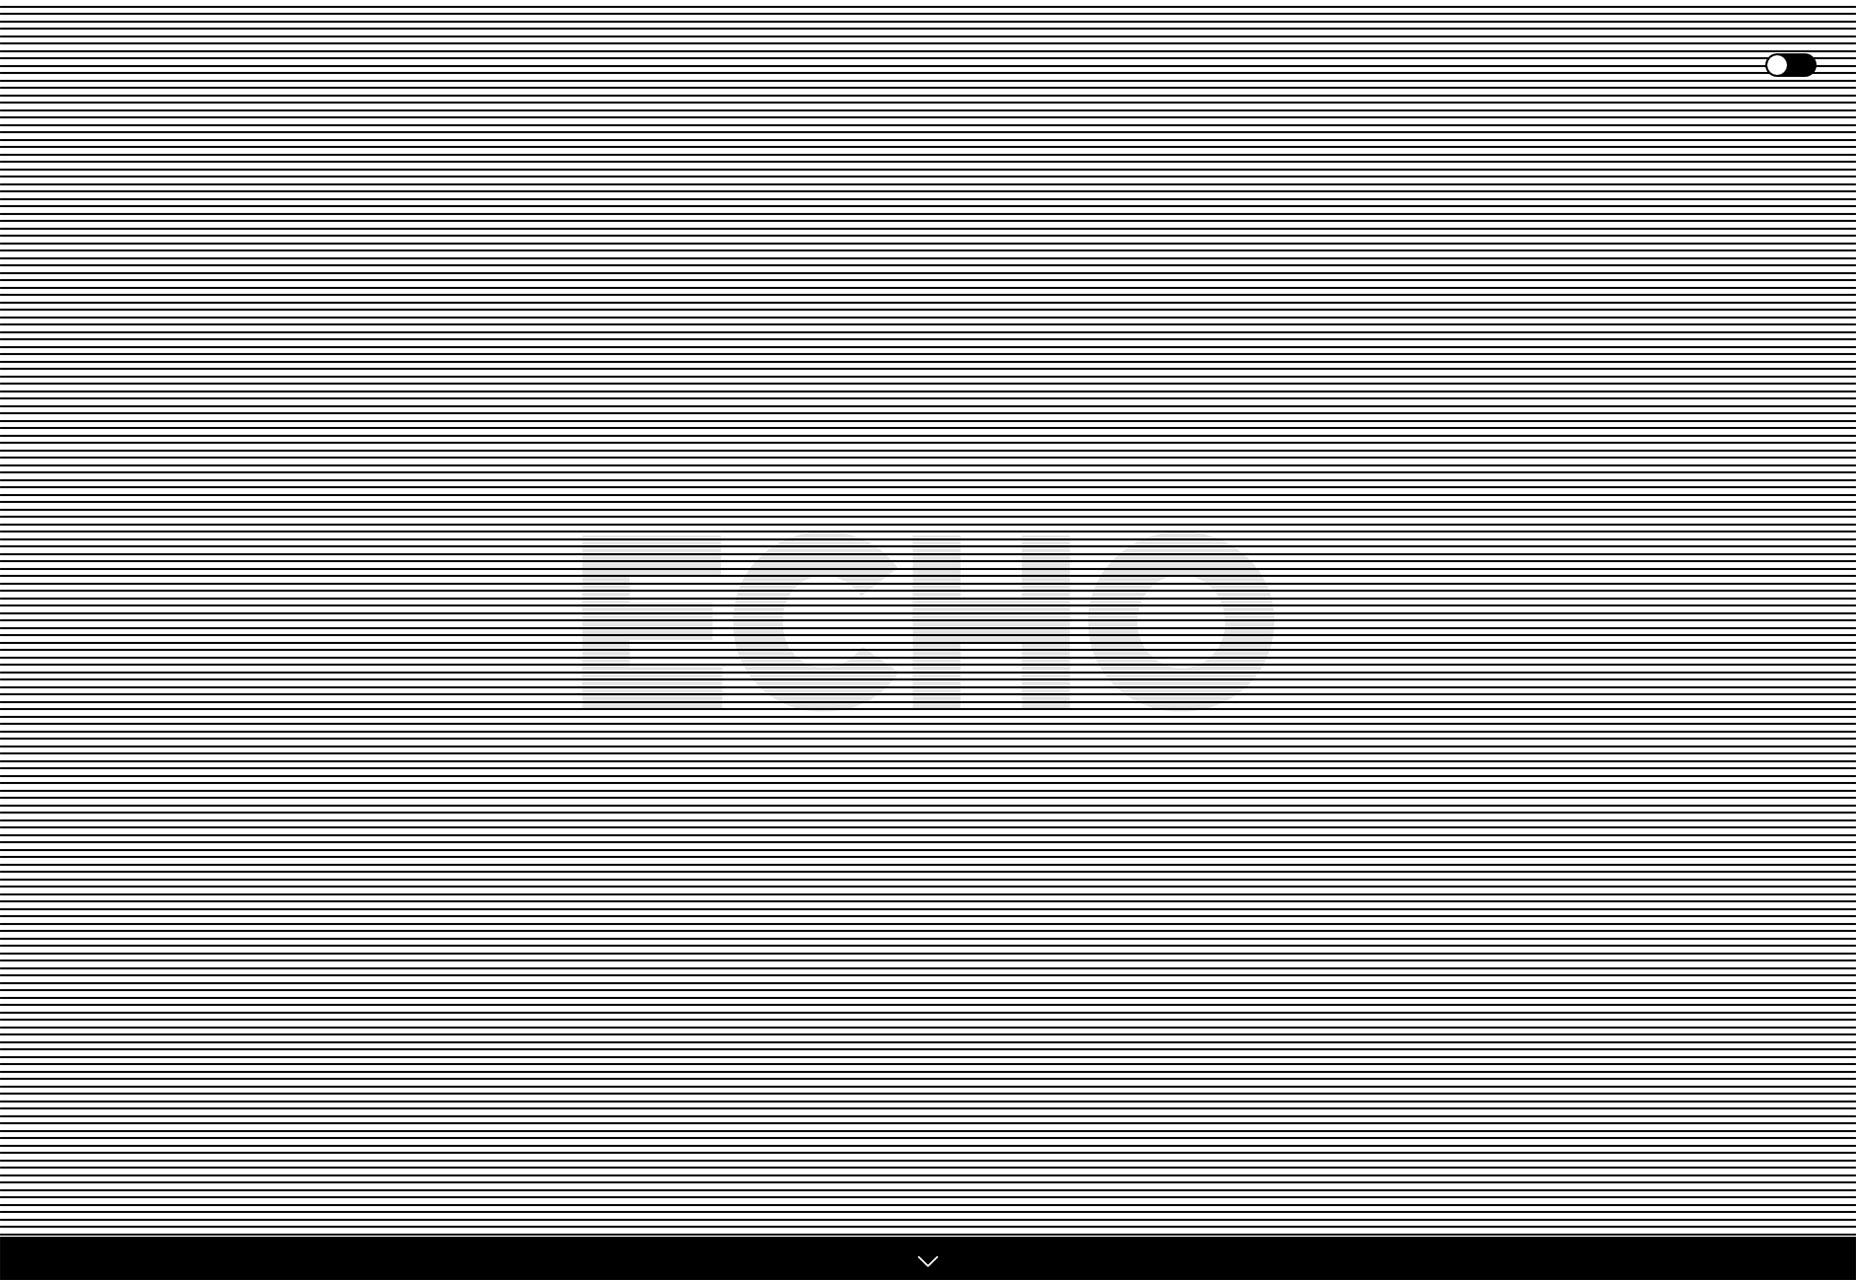 010_echo